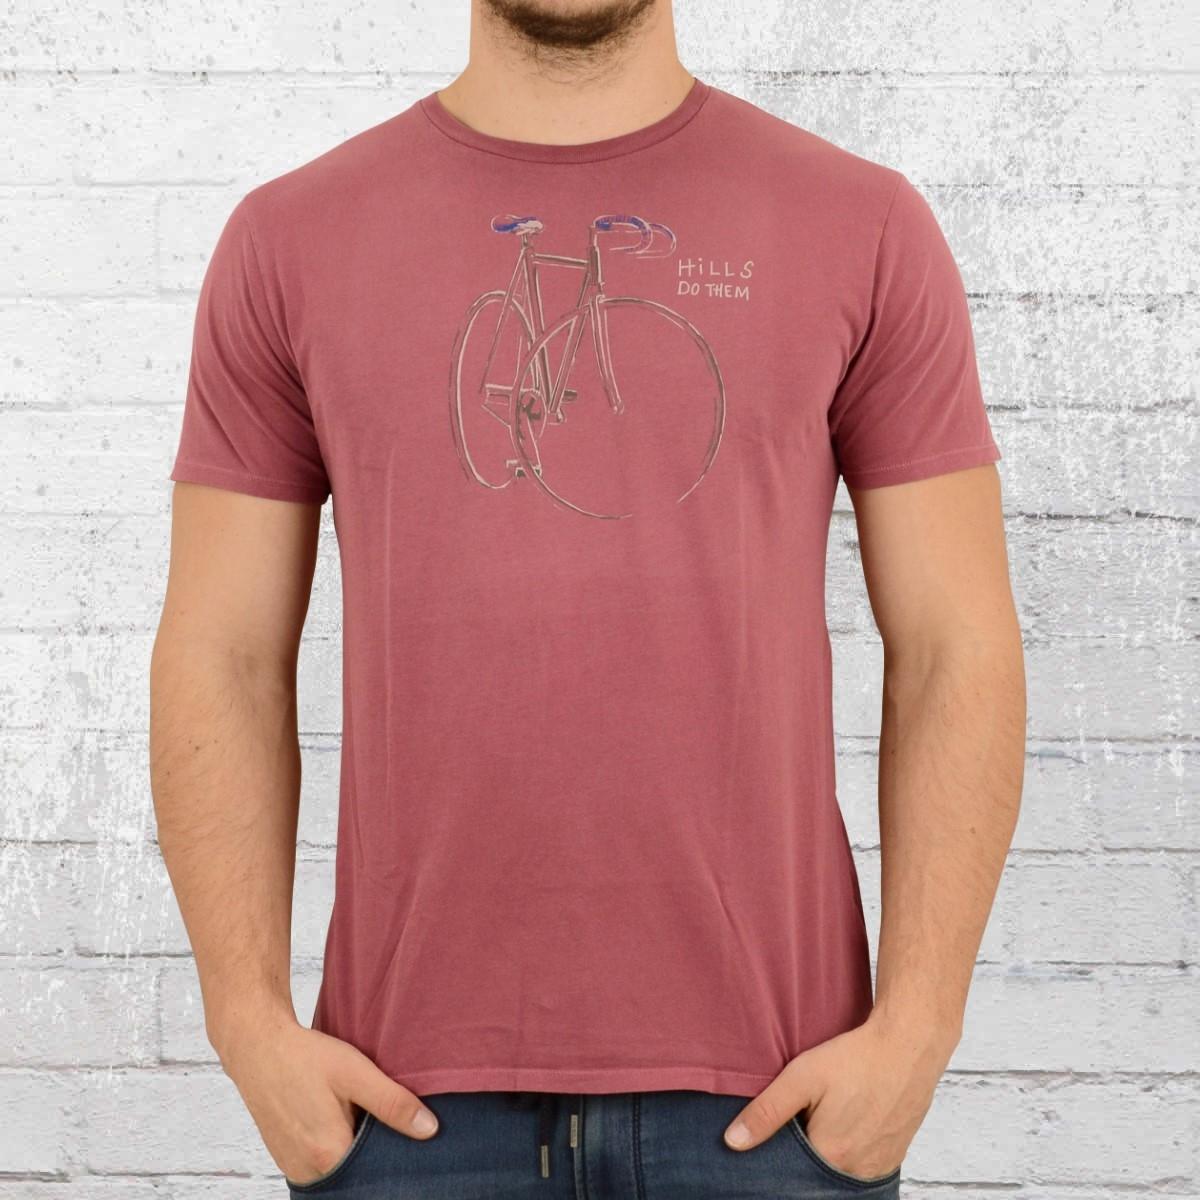 Greenbomb Fahrrad T-Shirt Herren Hills do them vintage rot